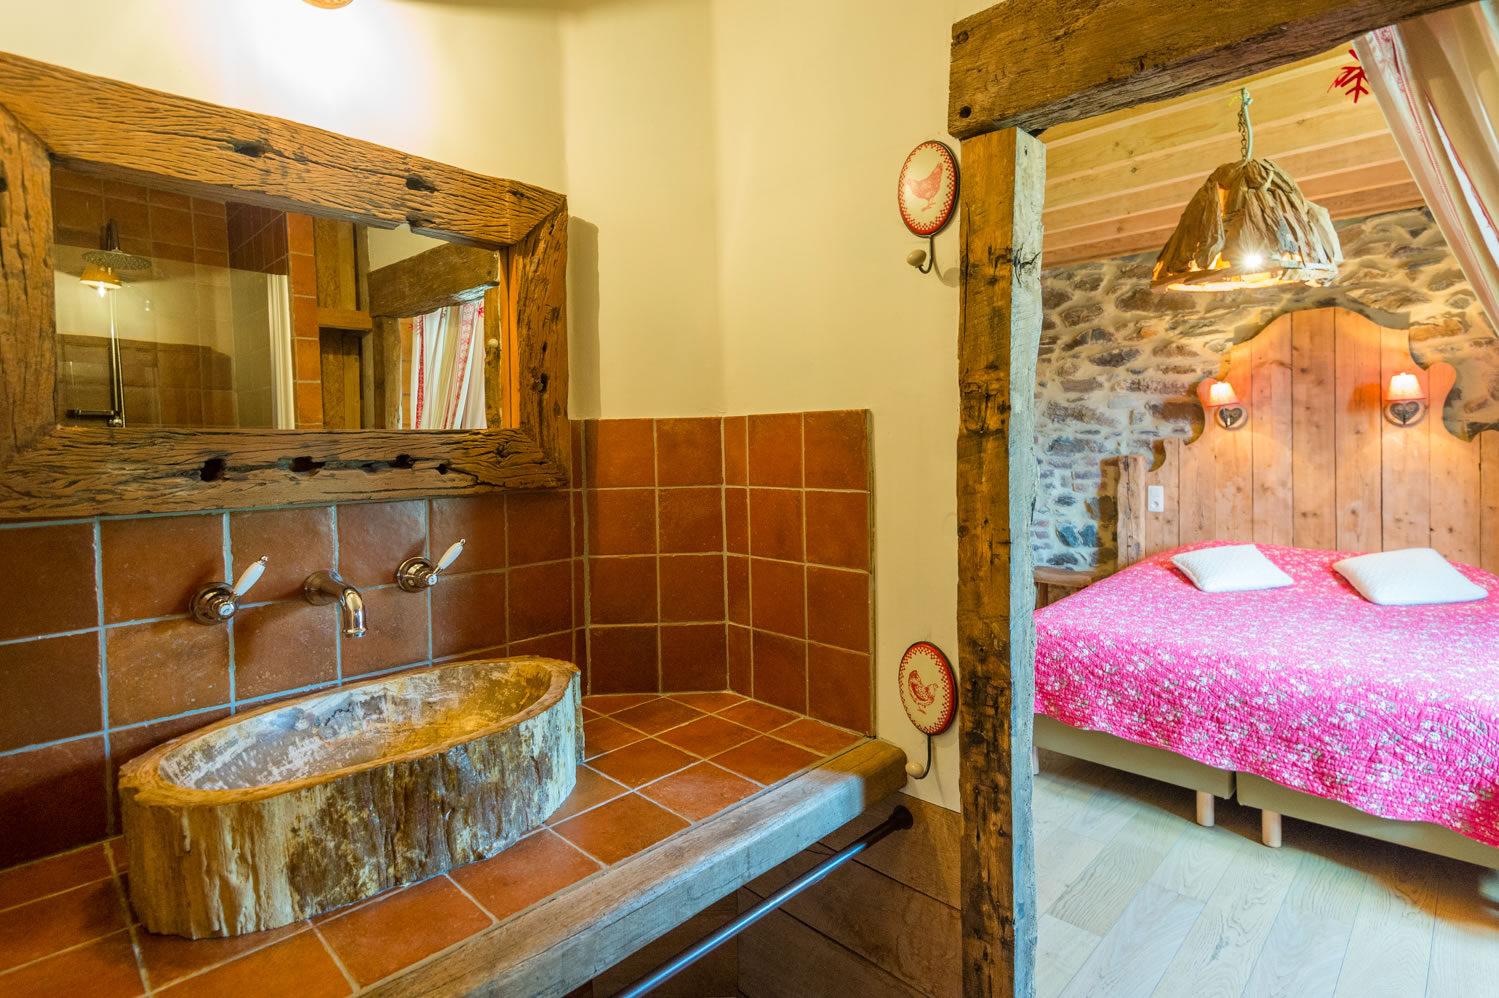 Salle de bain montagnarde